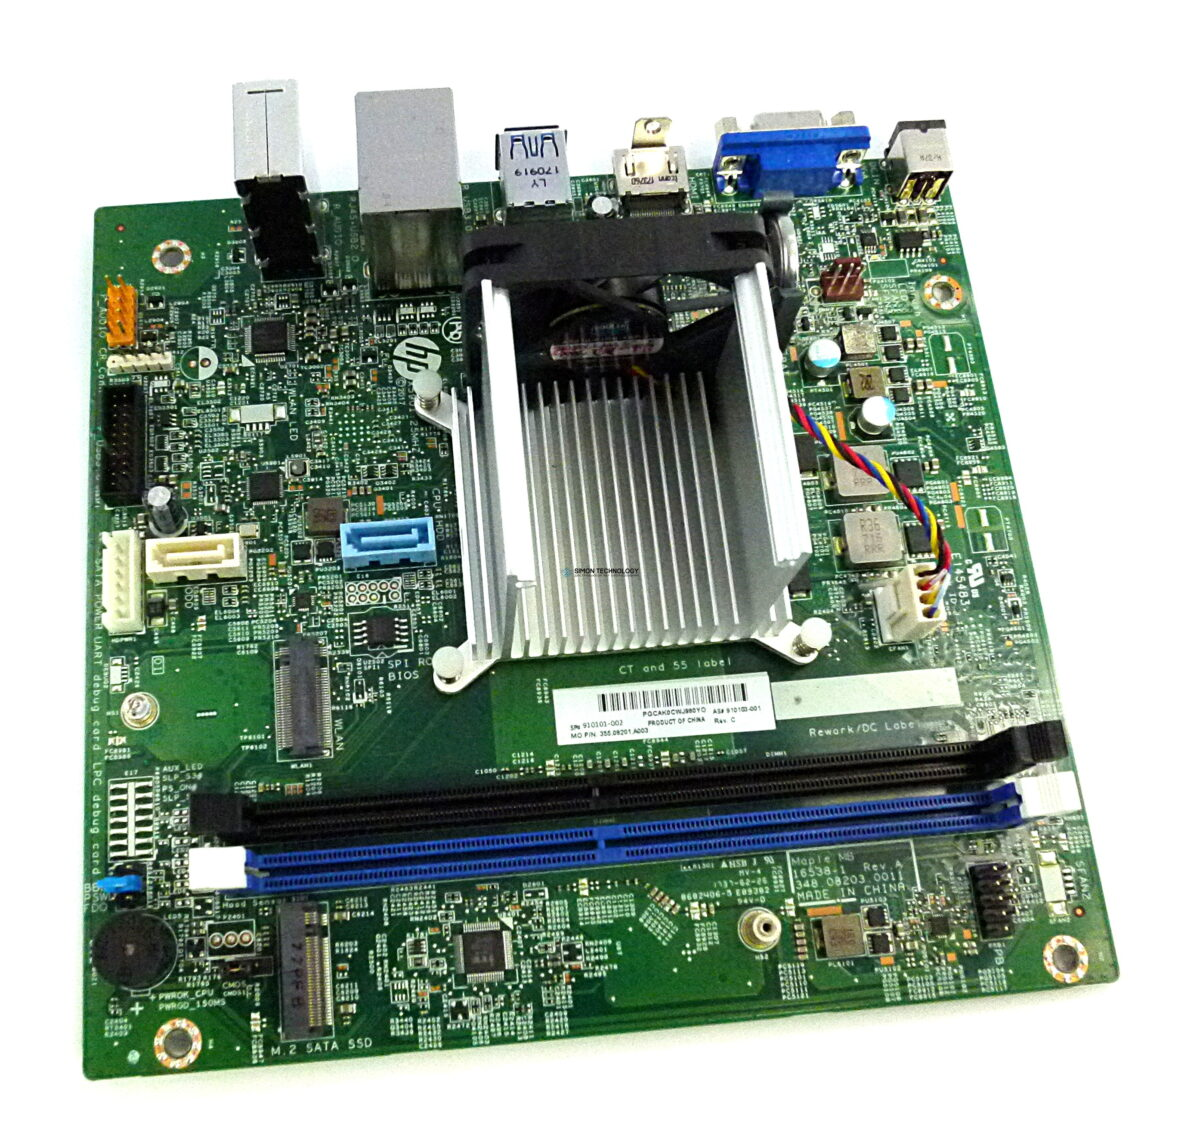 HPI MBD Maple-A9 AMD Stoney Ridge (910101-002)